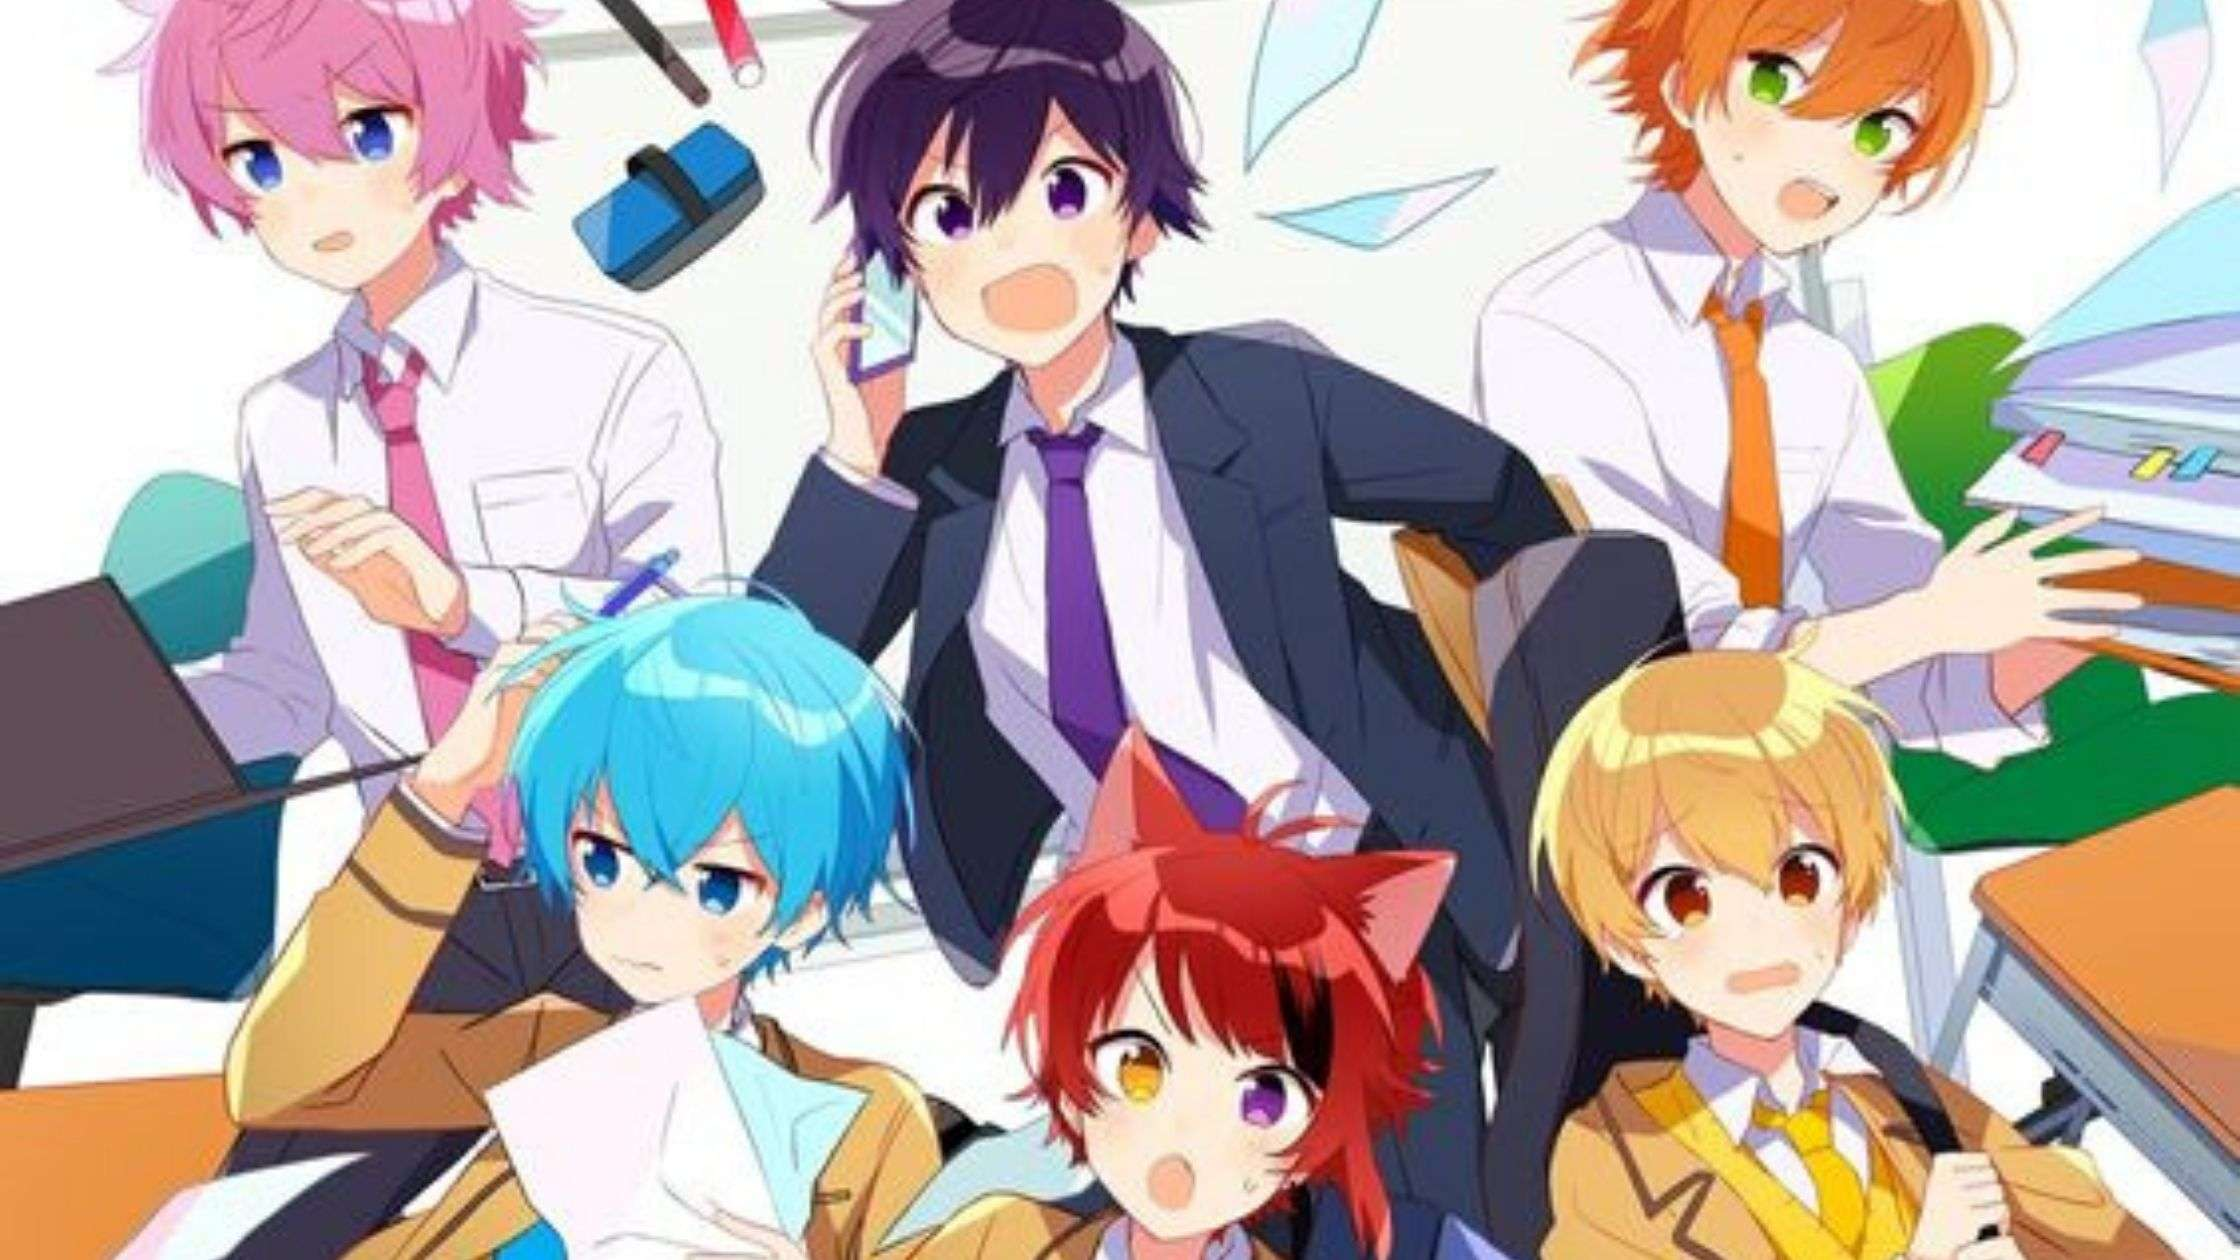 anime fan problems